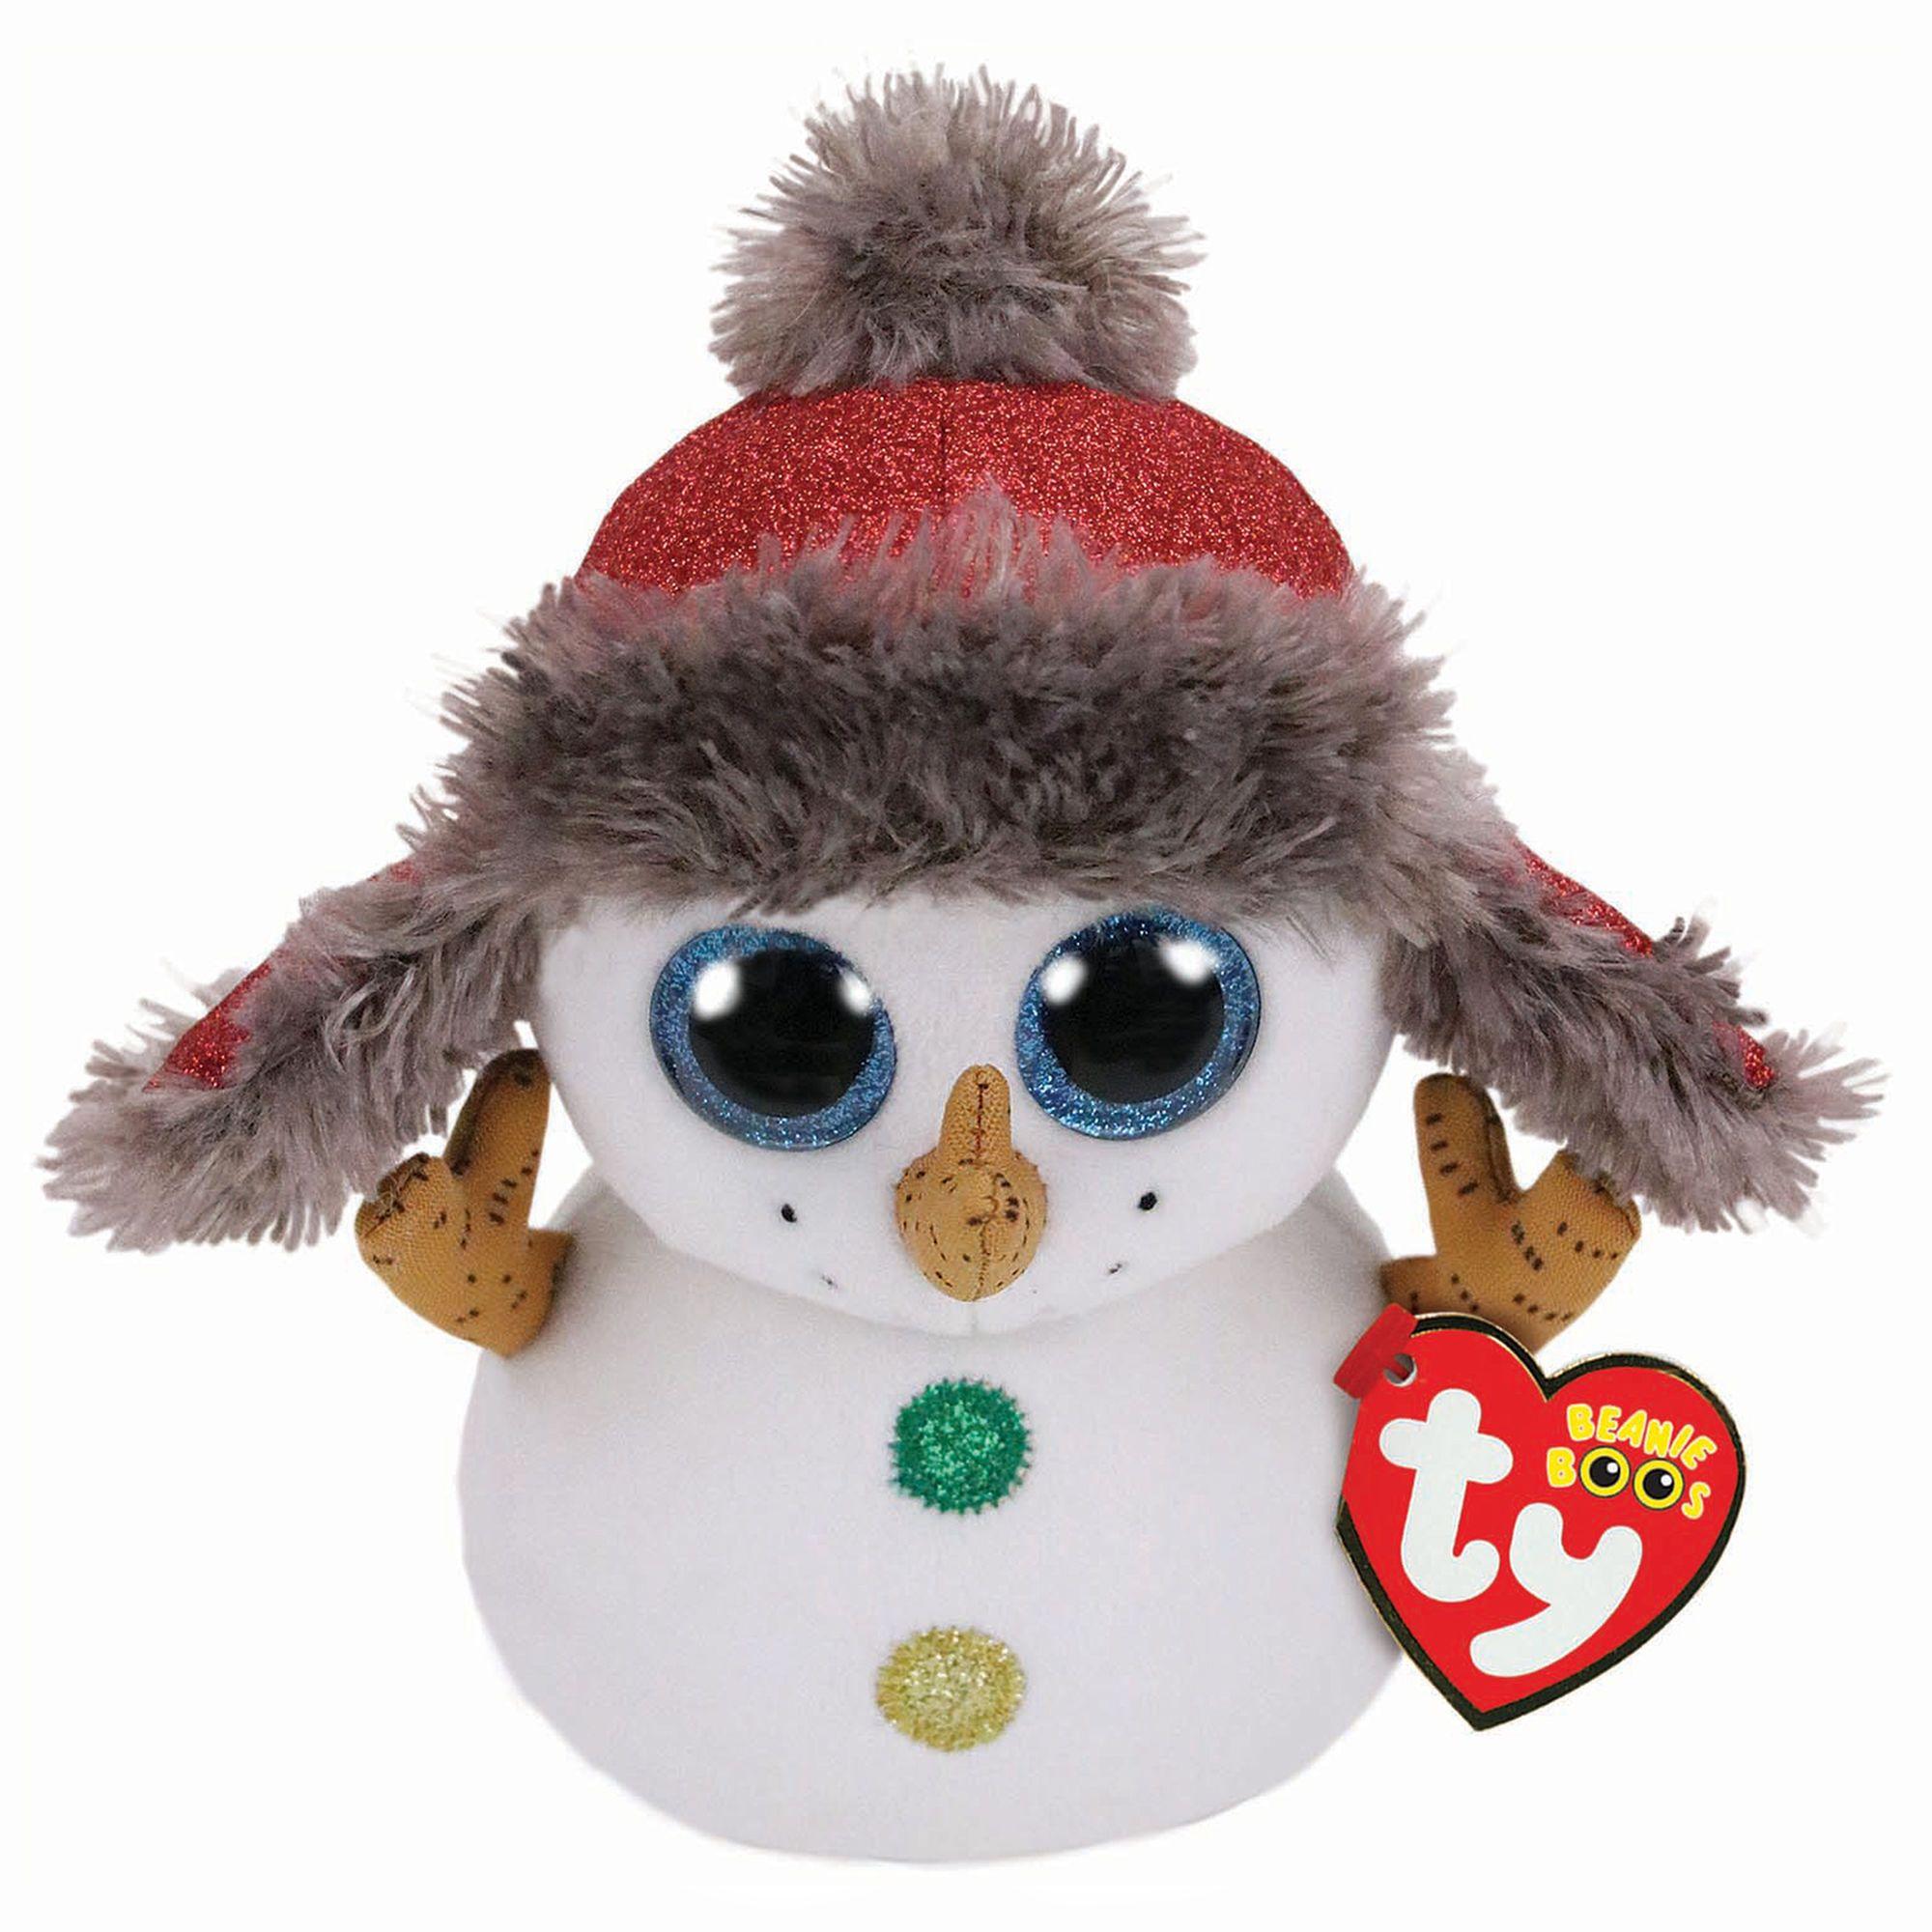 fb51f7c2c6f Ty Beanie Boo Medium Buttons the Snowman Plush Toy ...